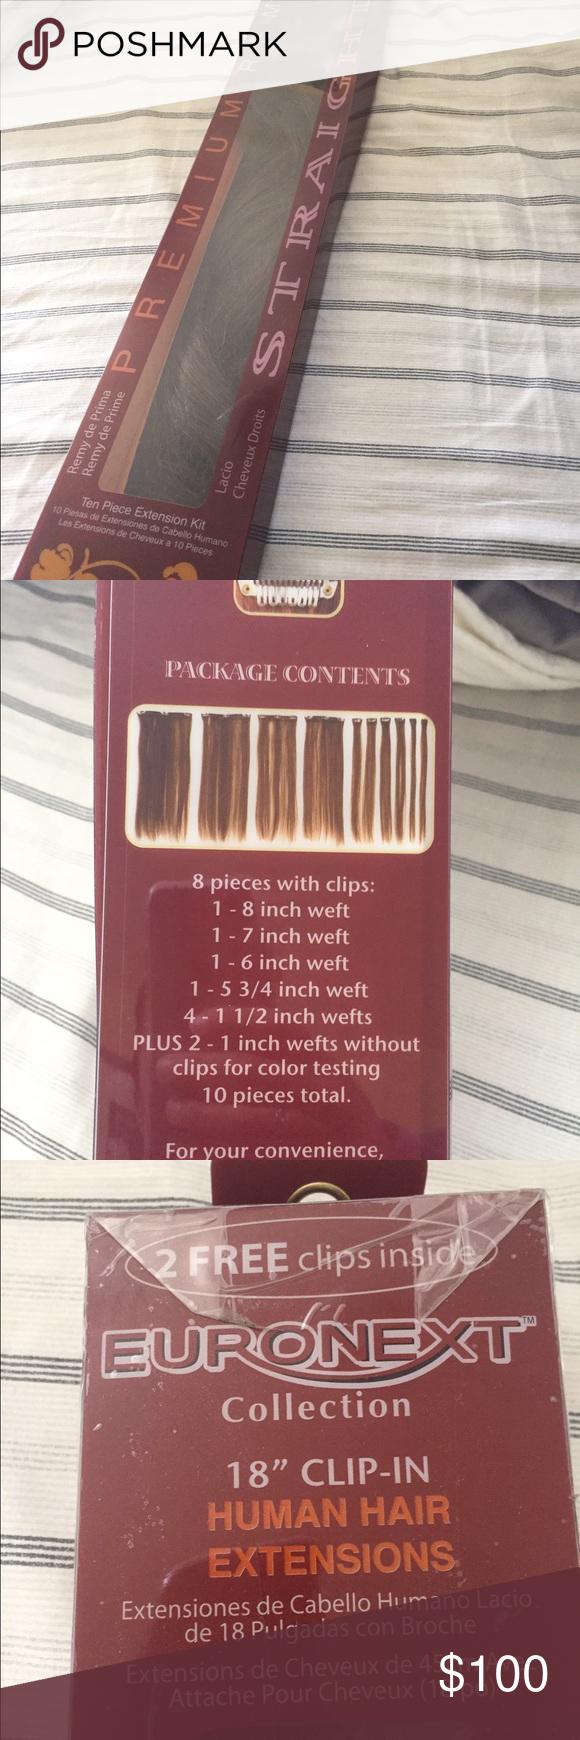 Premium remy human hair extensions 18 dark brown dark brown color premium remy human hair extensions 18 dark brown pmusecretfo Choice Image